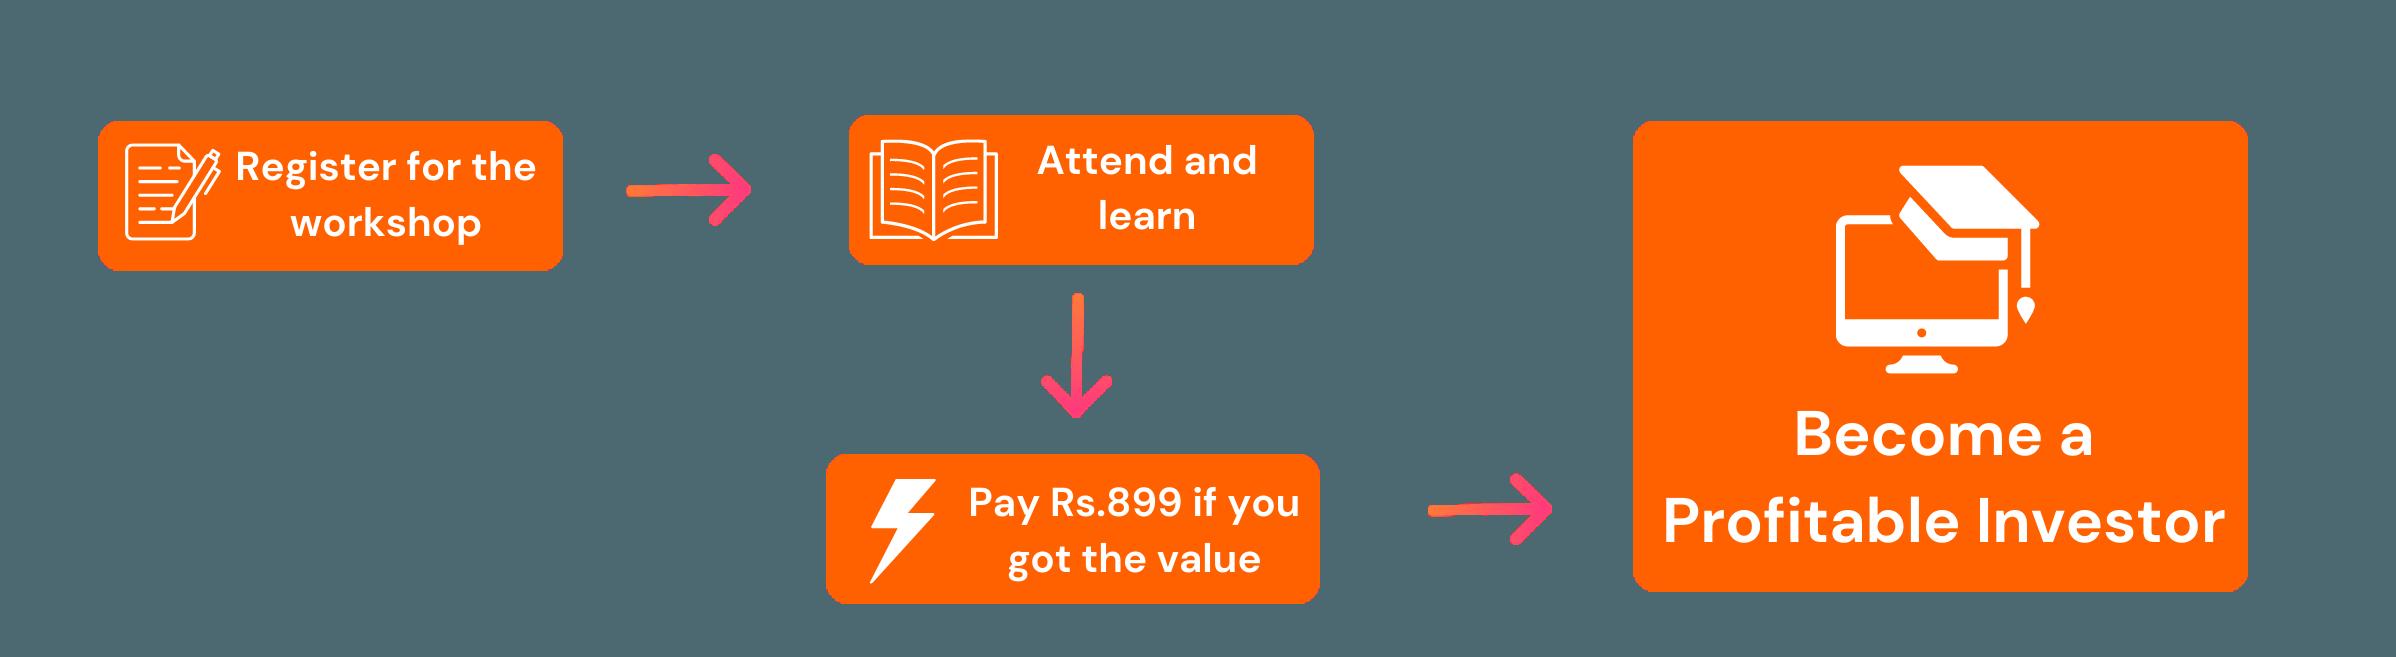 Become a profitable Investor (2)